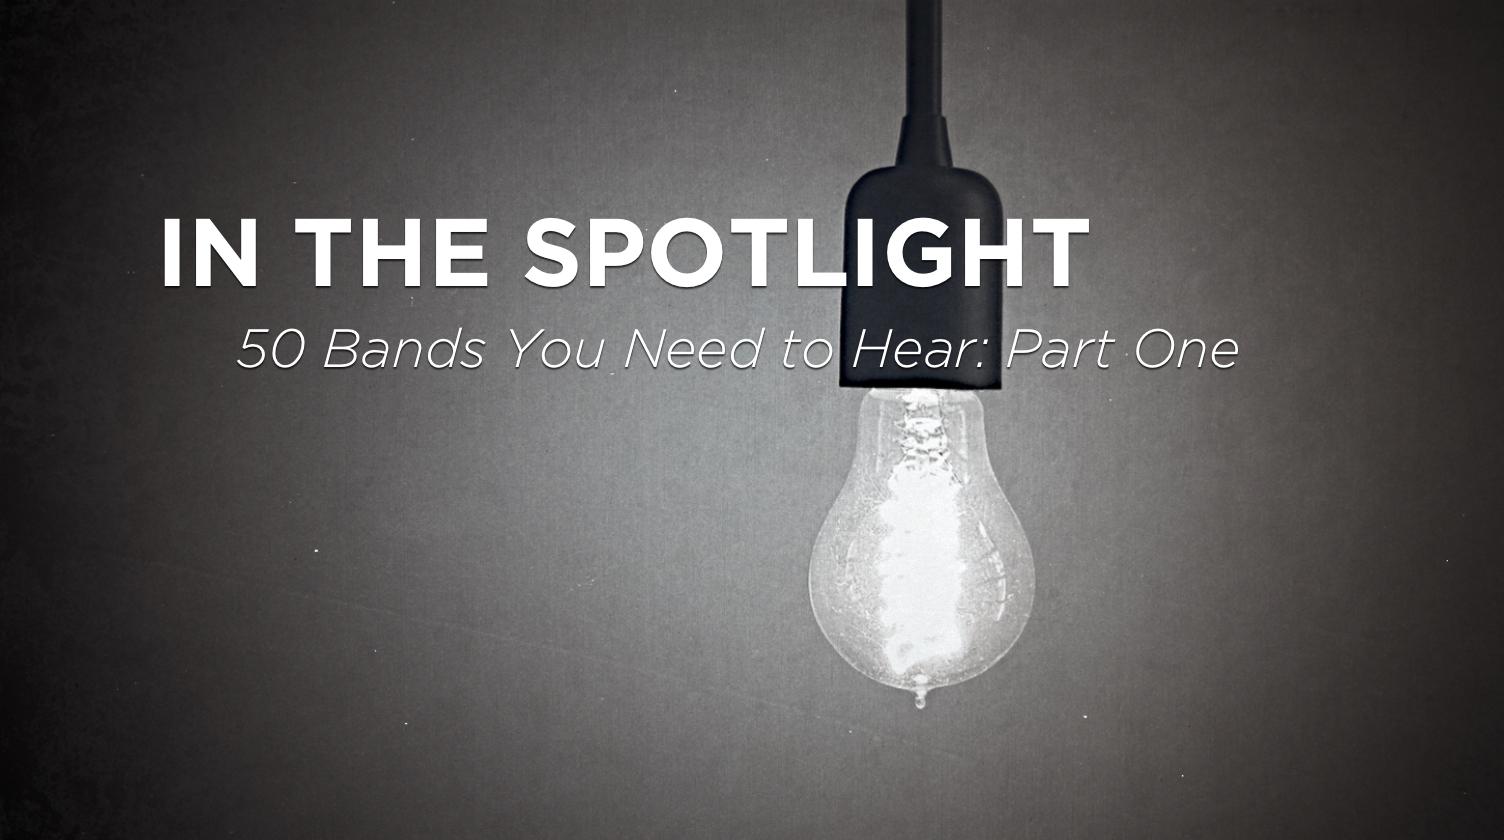 In the Spotlight (Part 1)